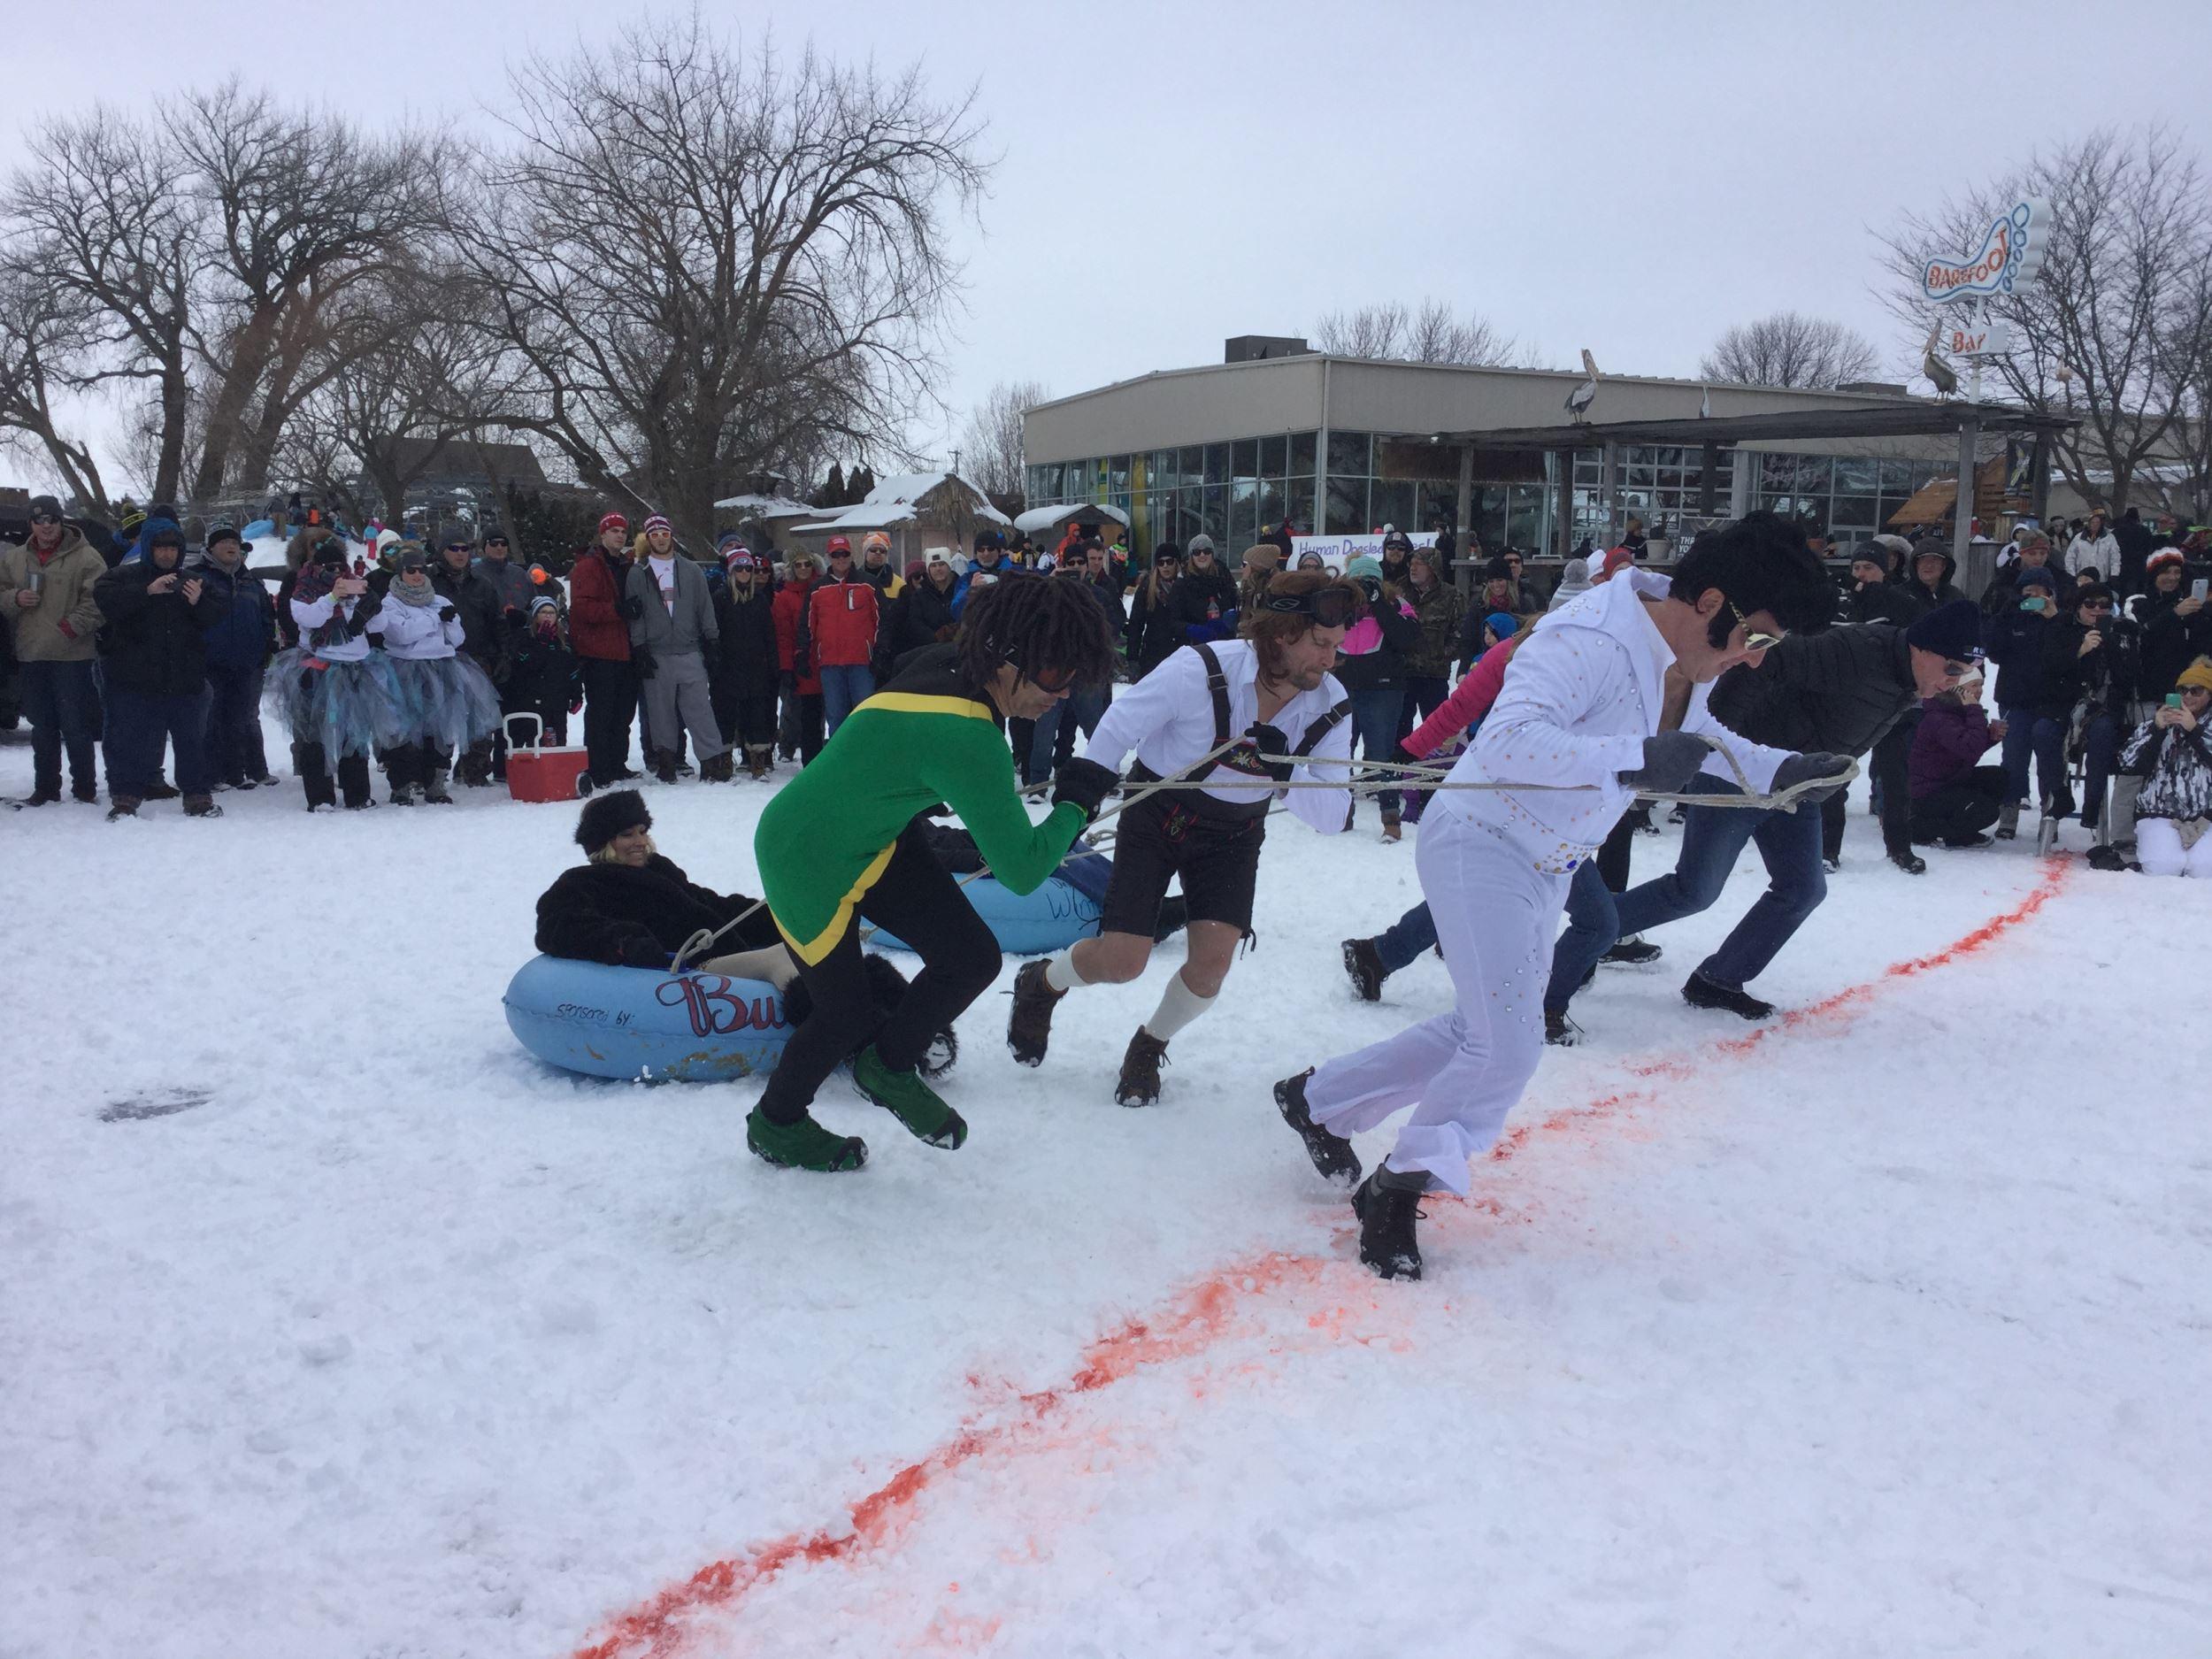 Winter Games 2018! - Parks Marina at Lake Okoboji